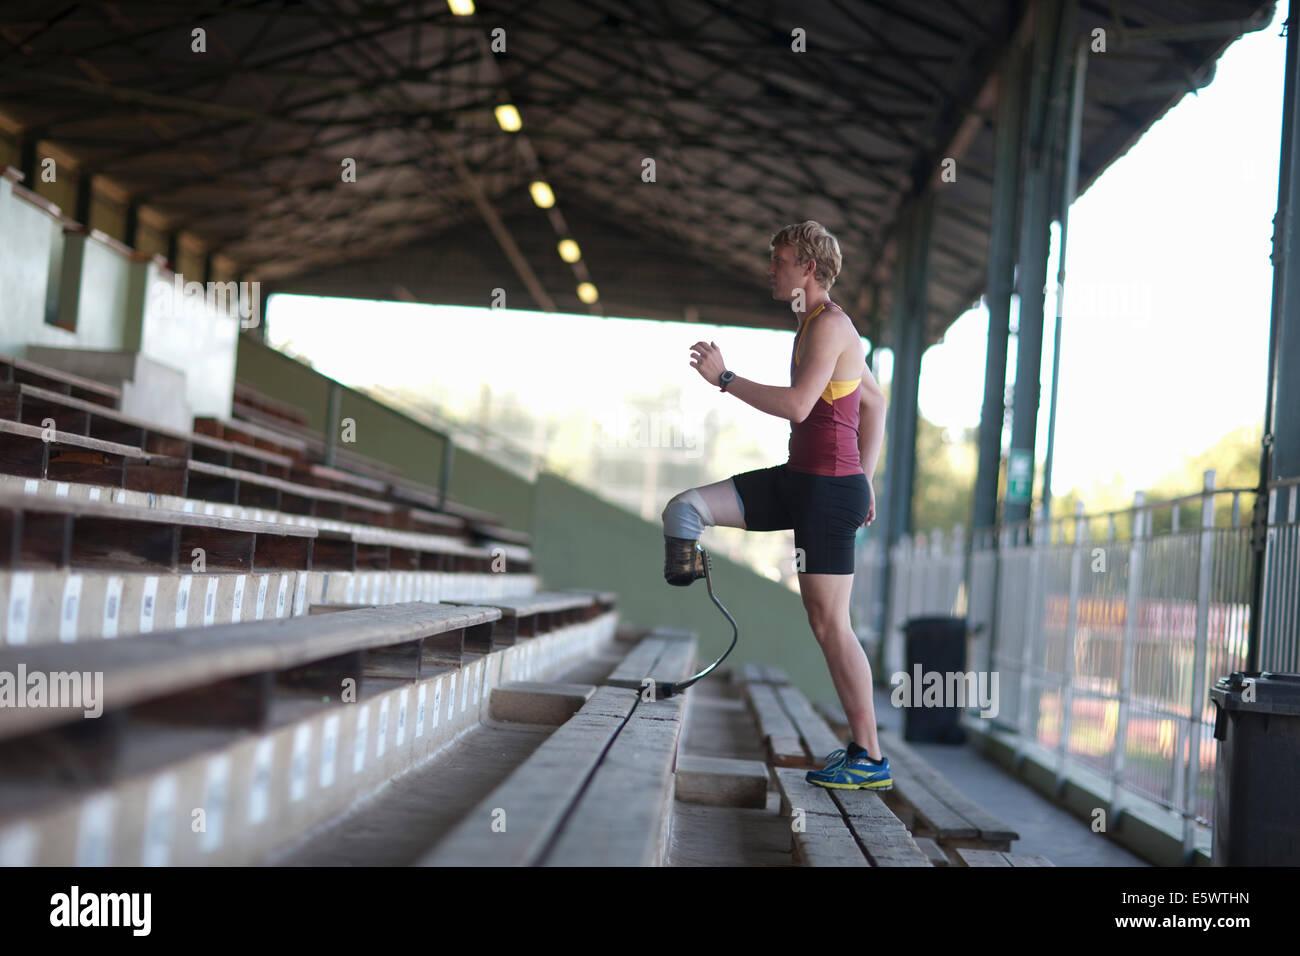 Sprinter walking with prosthetic leg on - Stock Image